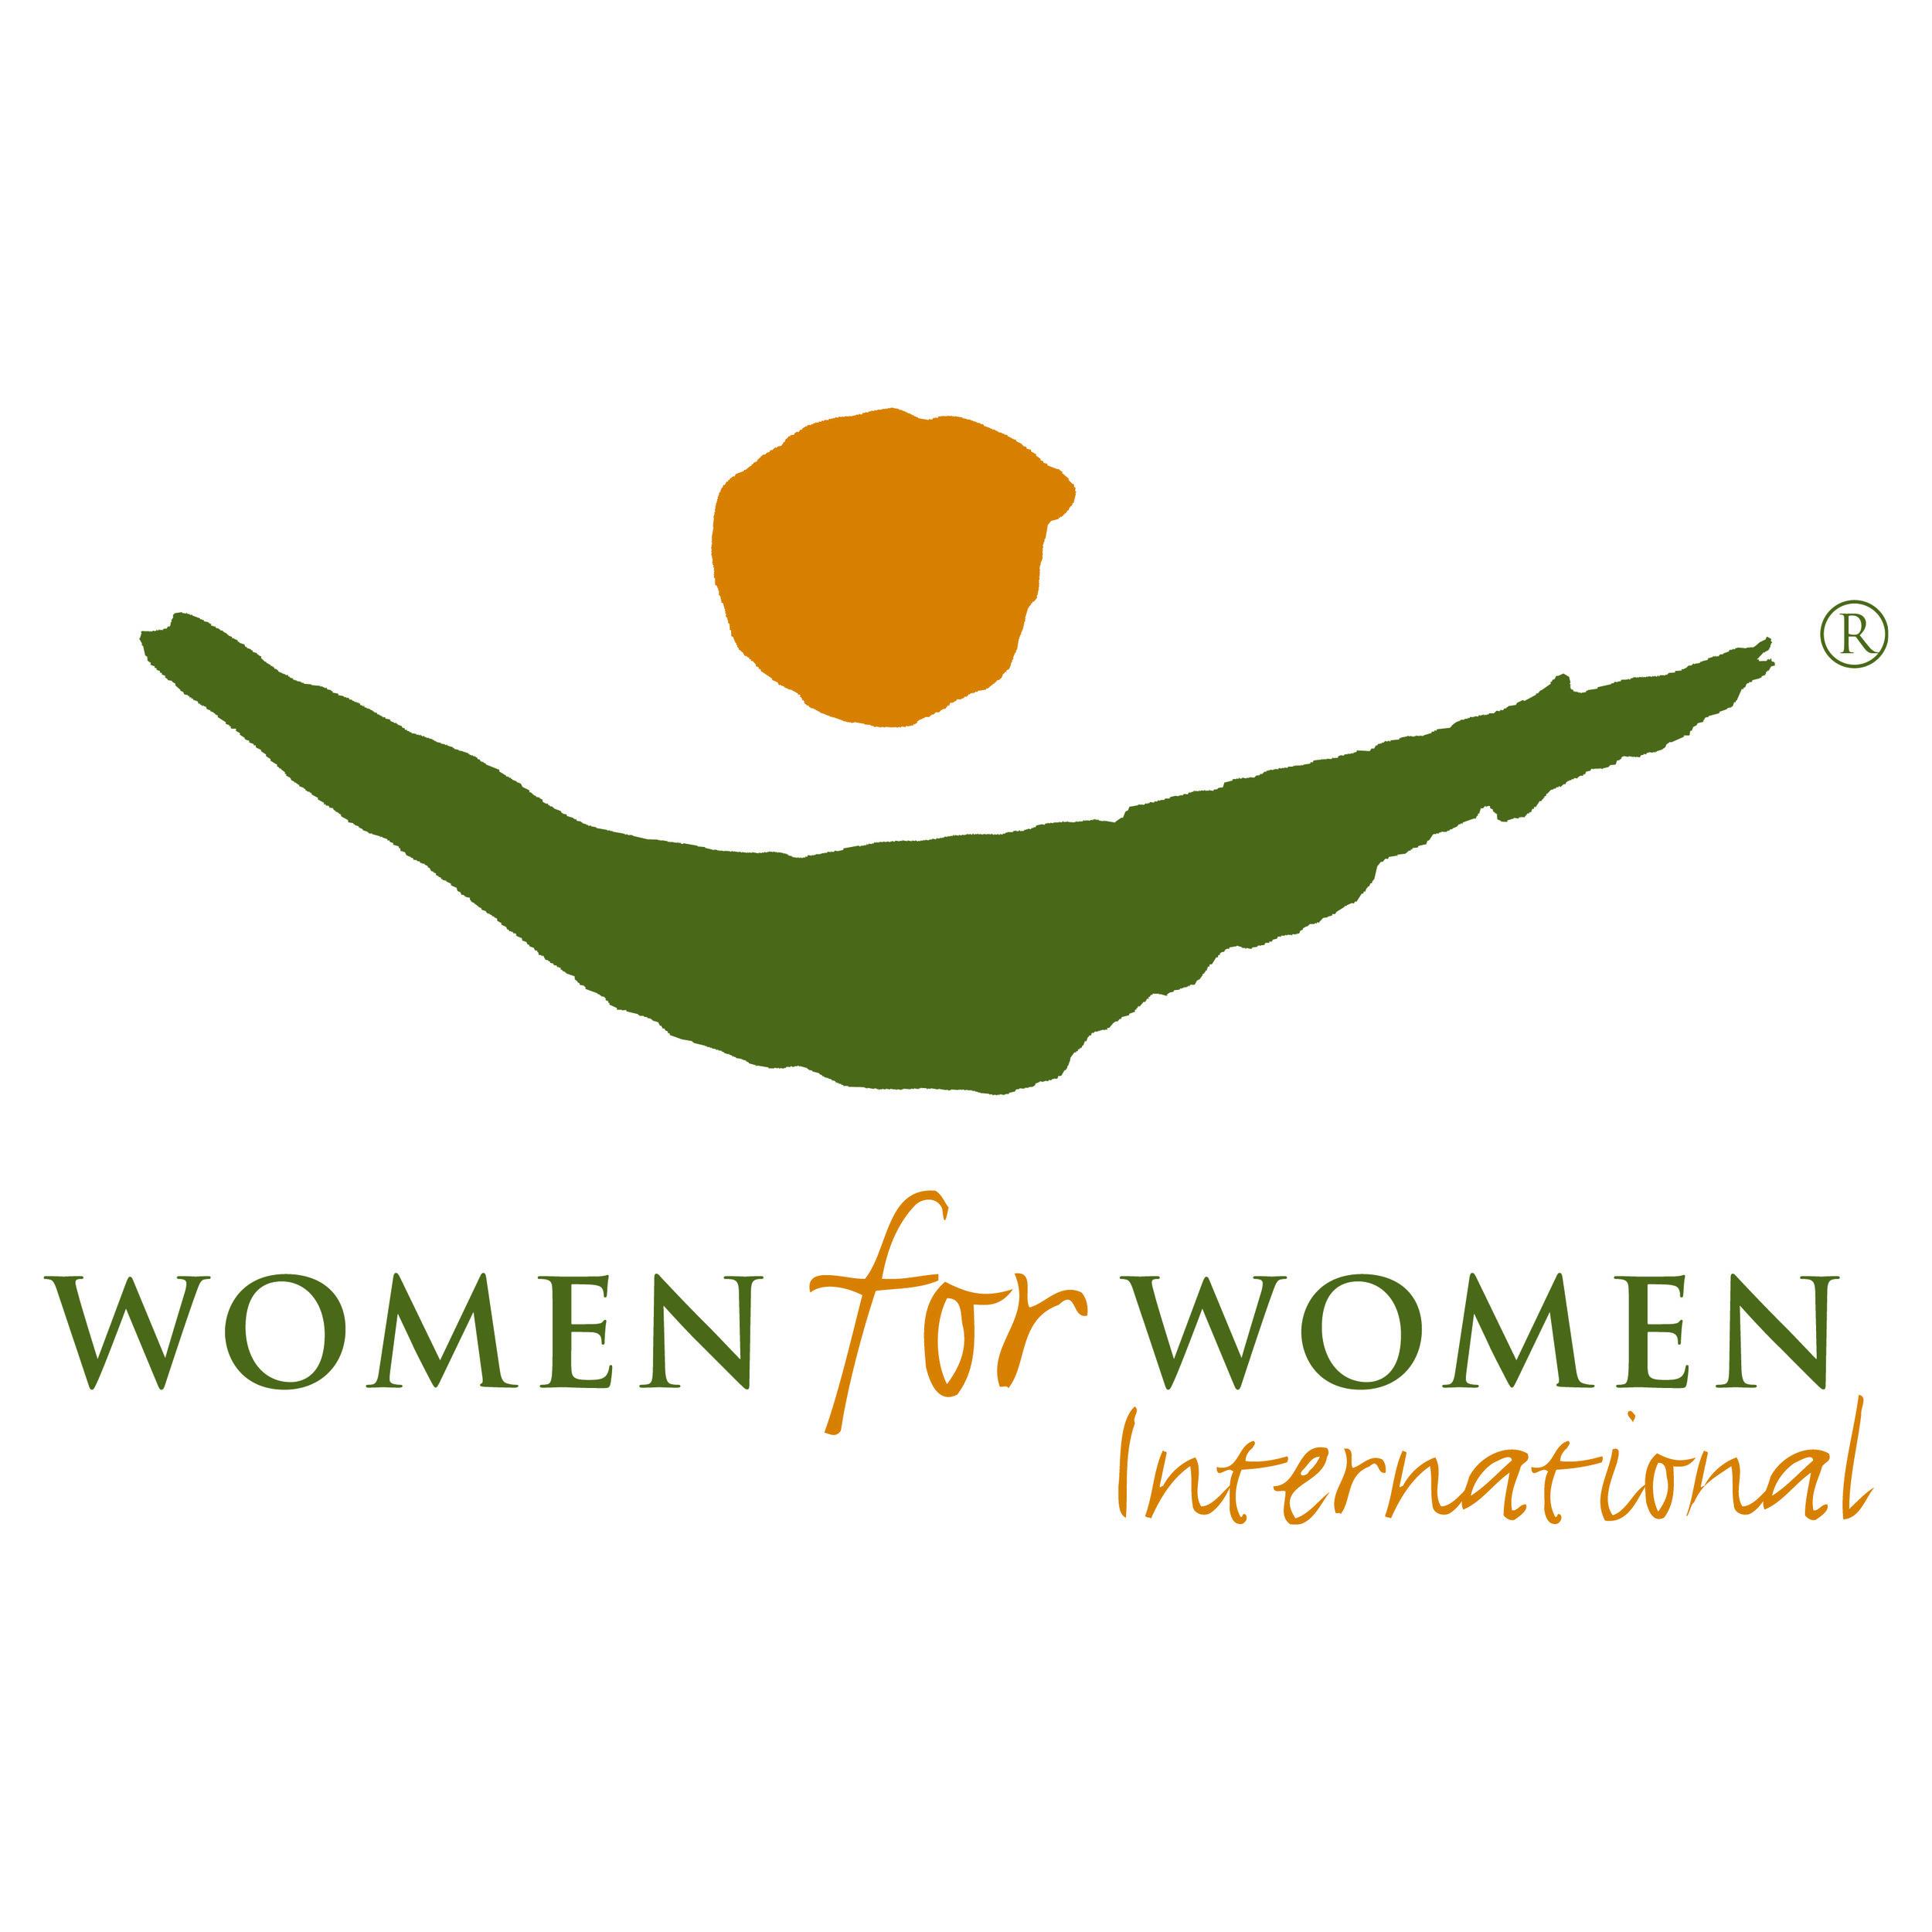 WFW-Logo-International-large.jpg